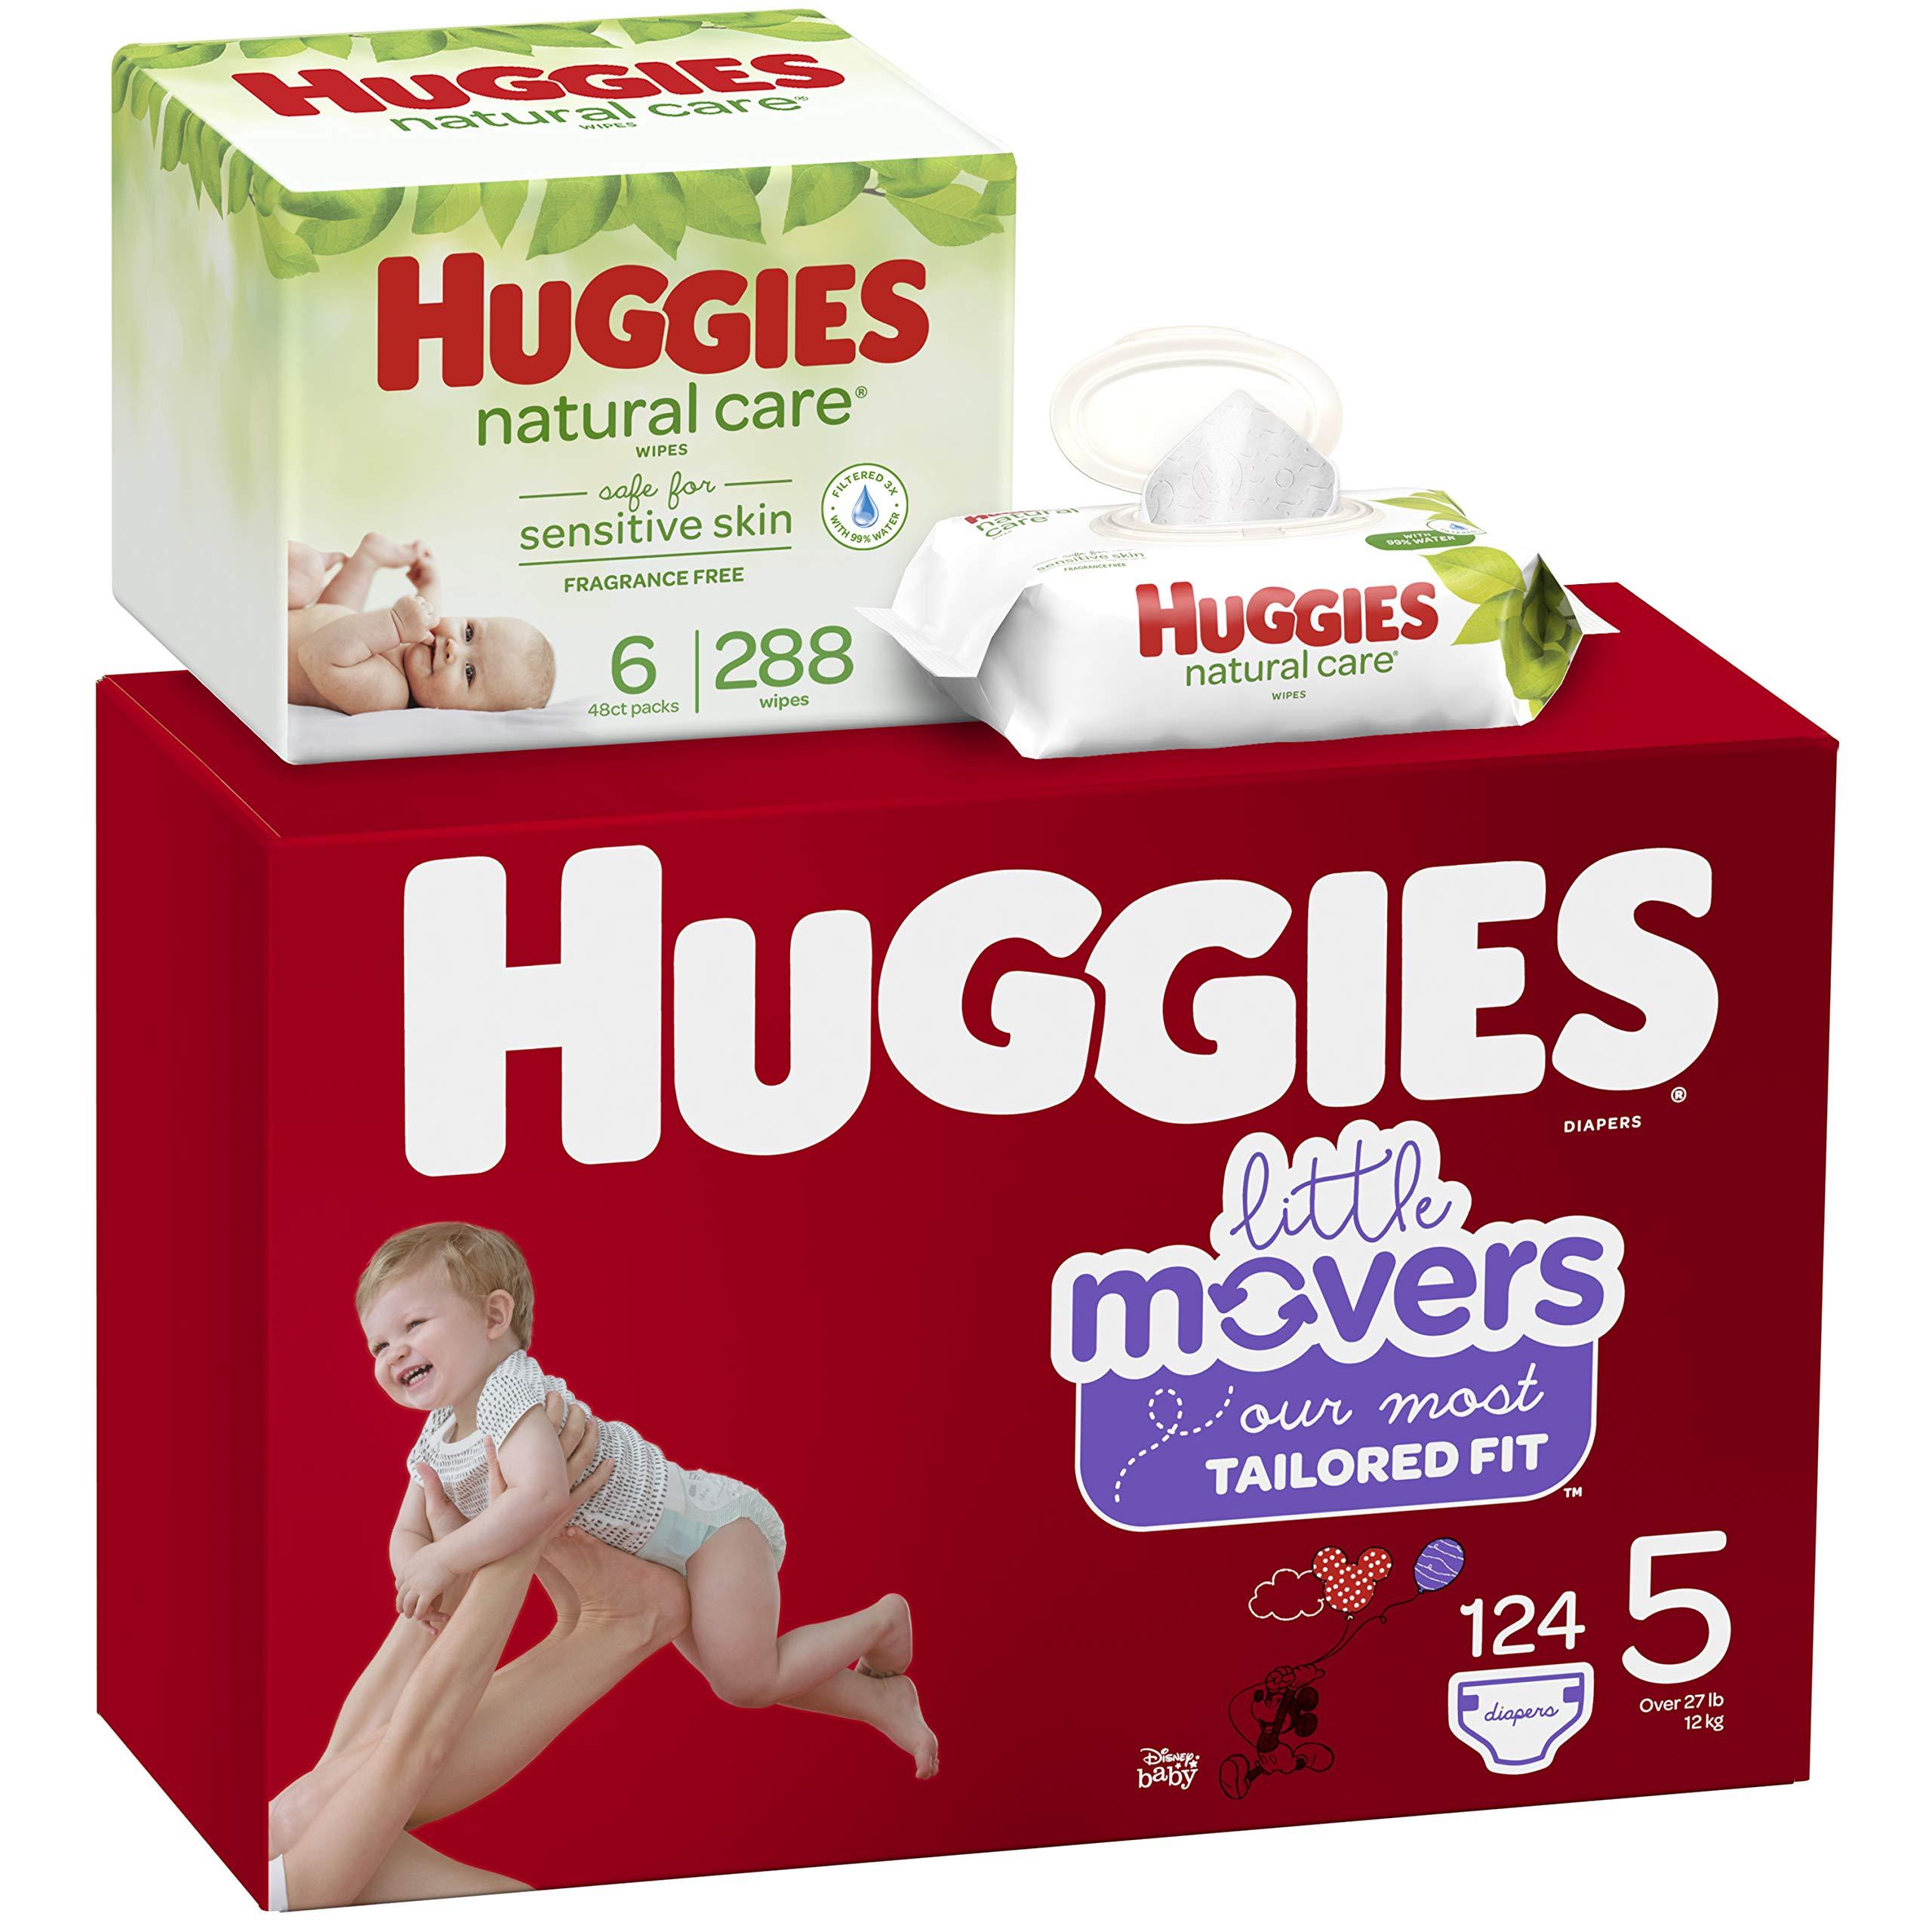 Huggies Brand Bundle